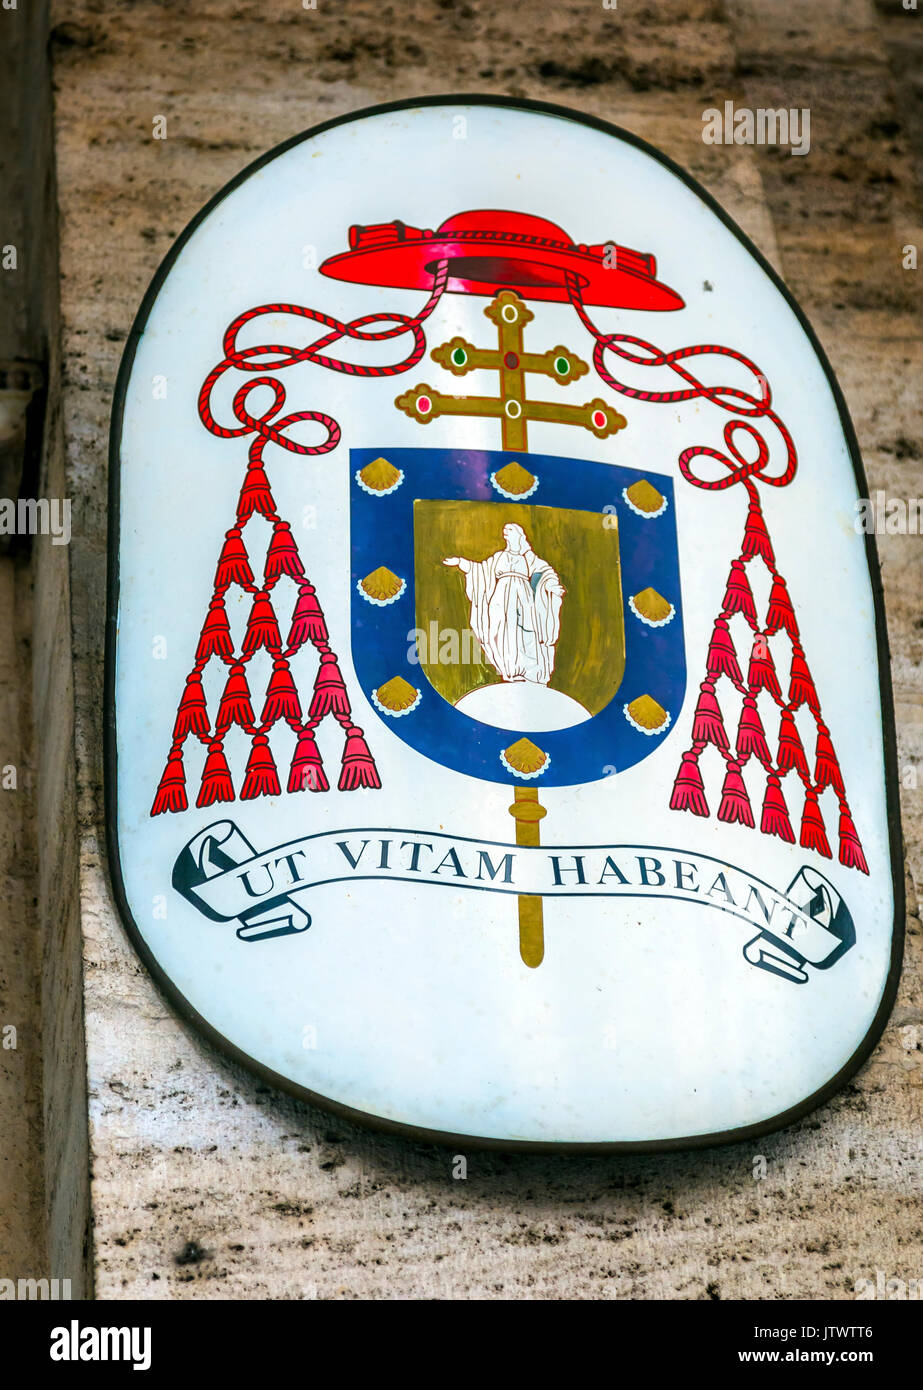 Cardinal hat stock photos cardinal hat stock images alamy red hat cardinal symbol ss vincenzo e anastasio church basilica dome trevi rome italy vincenzo buycottarizona Images